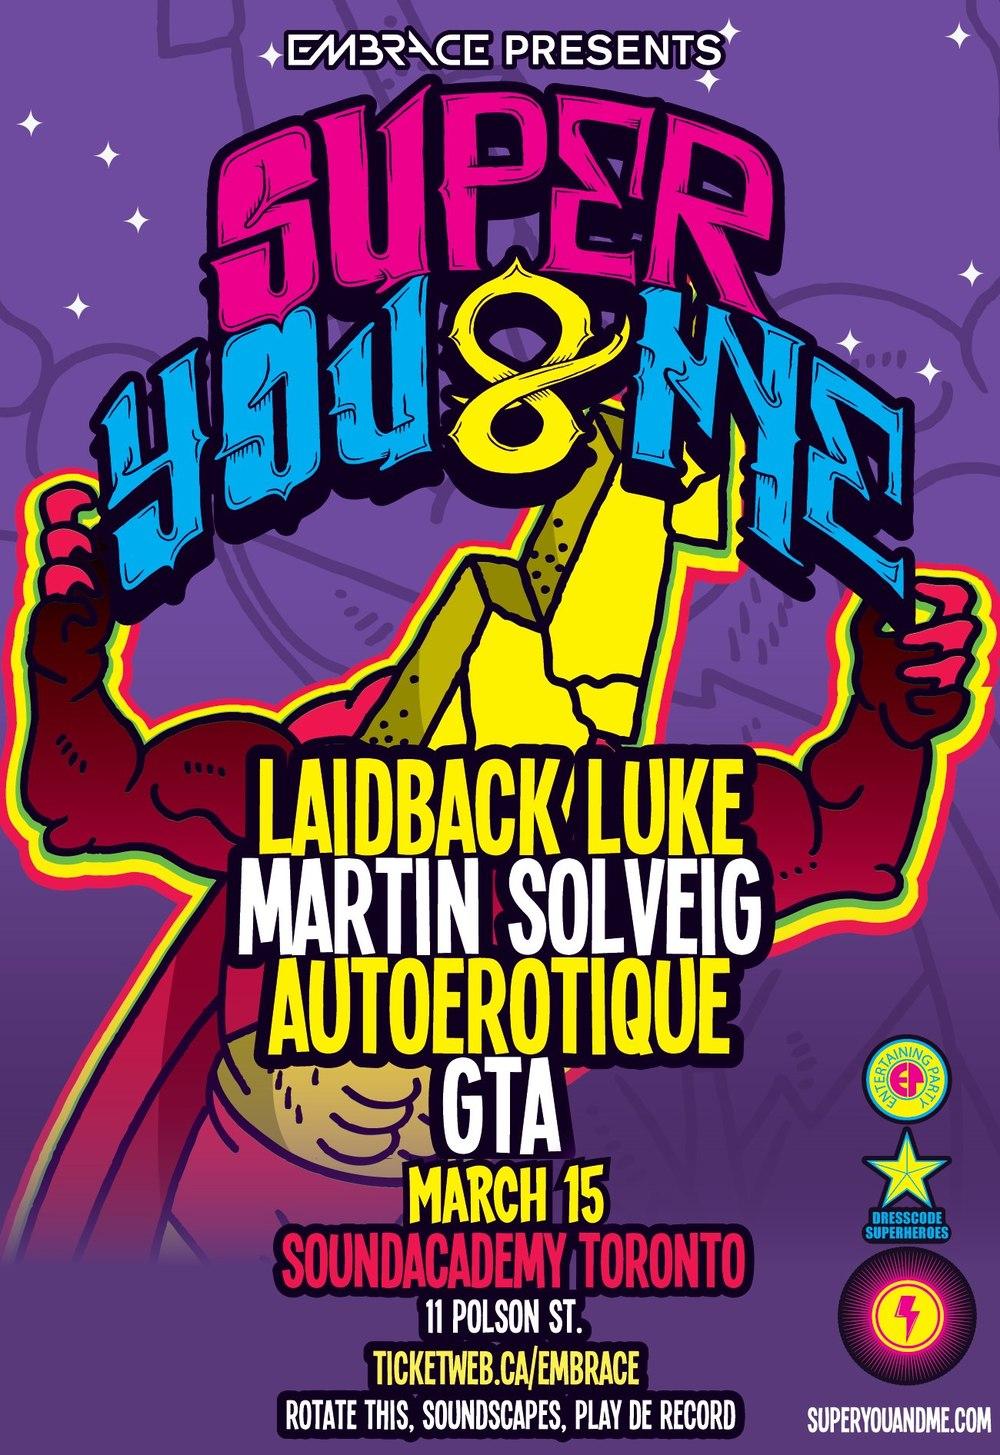 Laidback Luke, Martin Solveig, Autoerotique, GTA Sound Academy Toronto